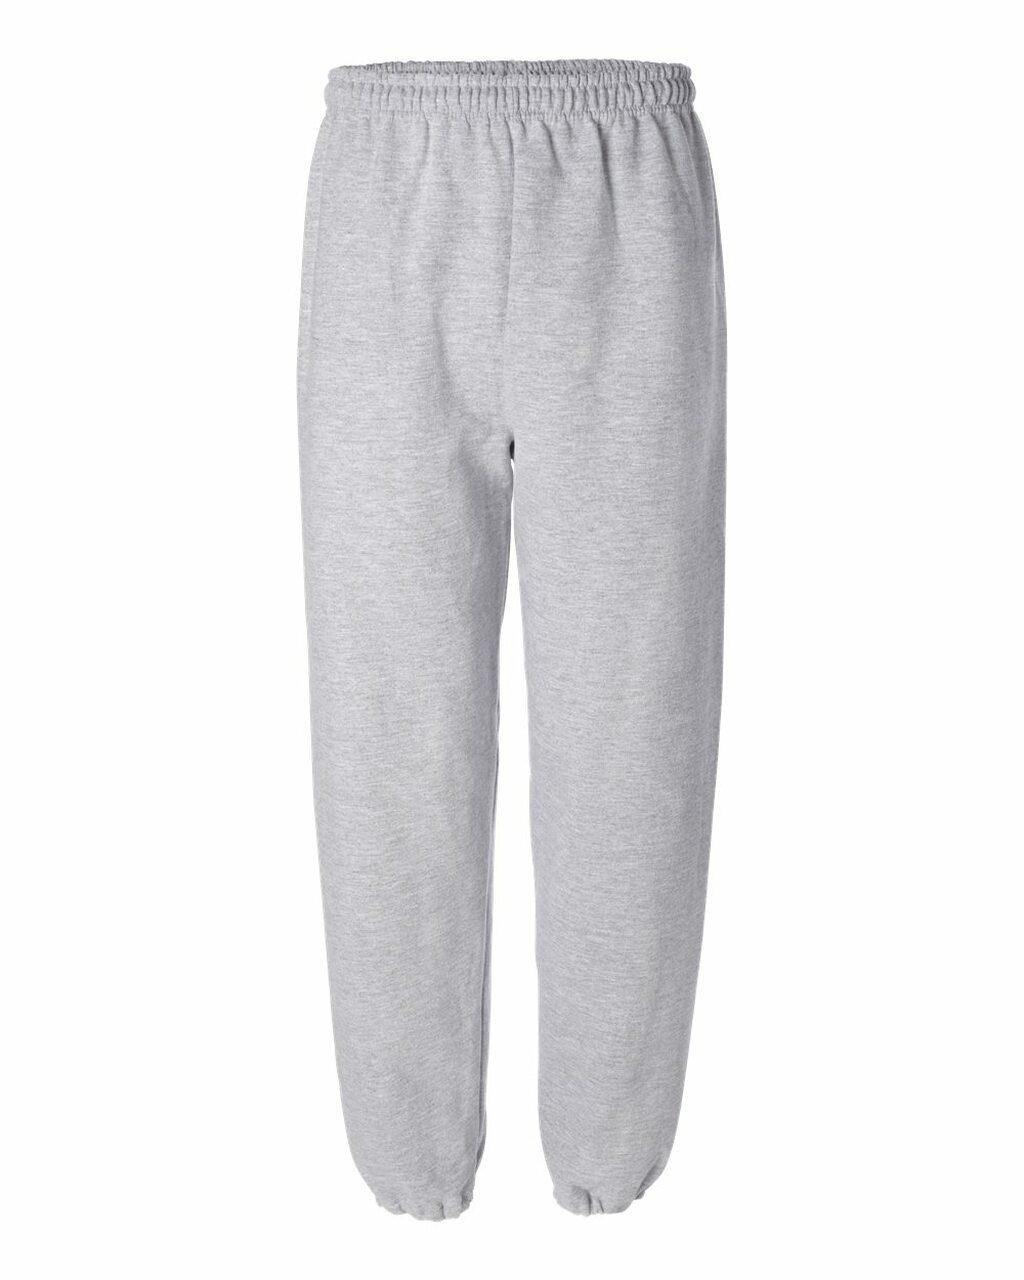 18200 Gildan Cuffed Bottom Fleece Pants